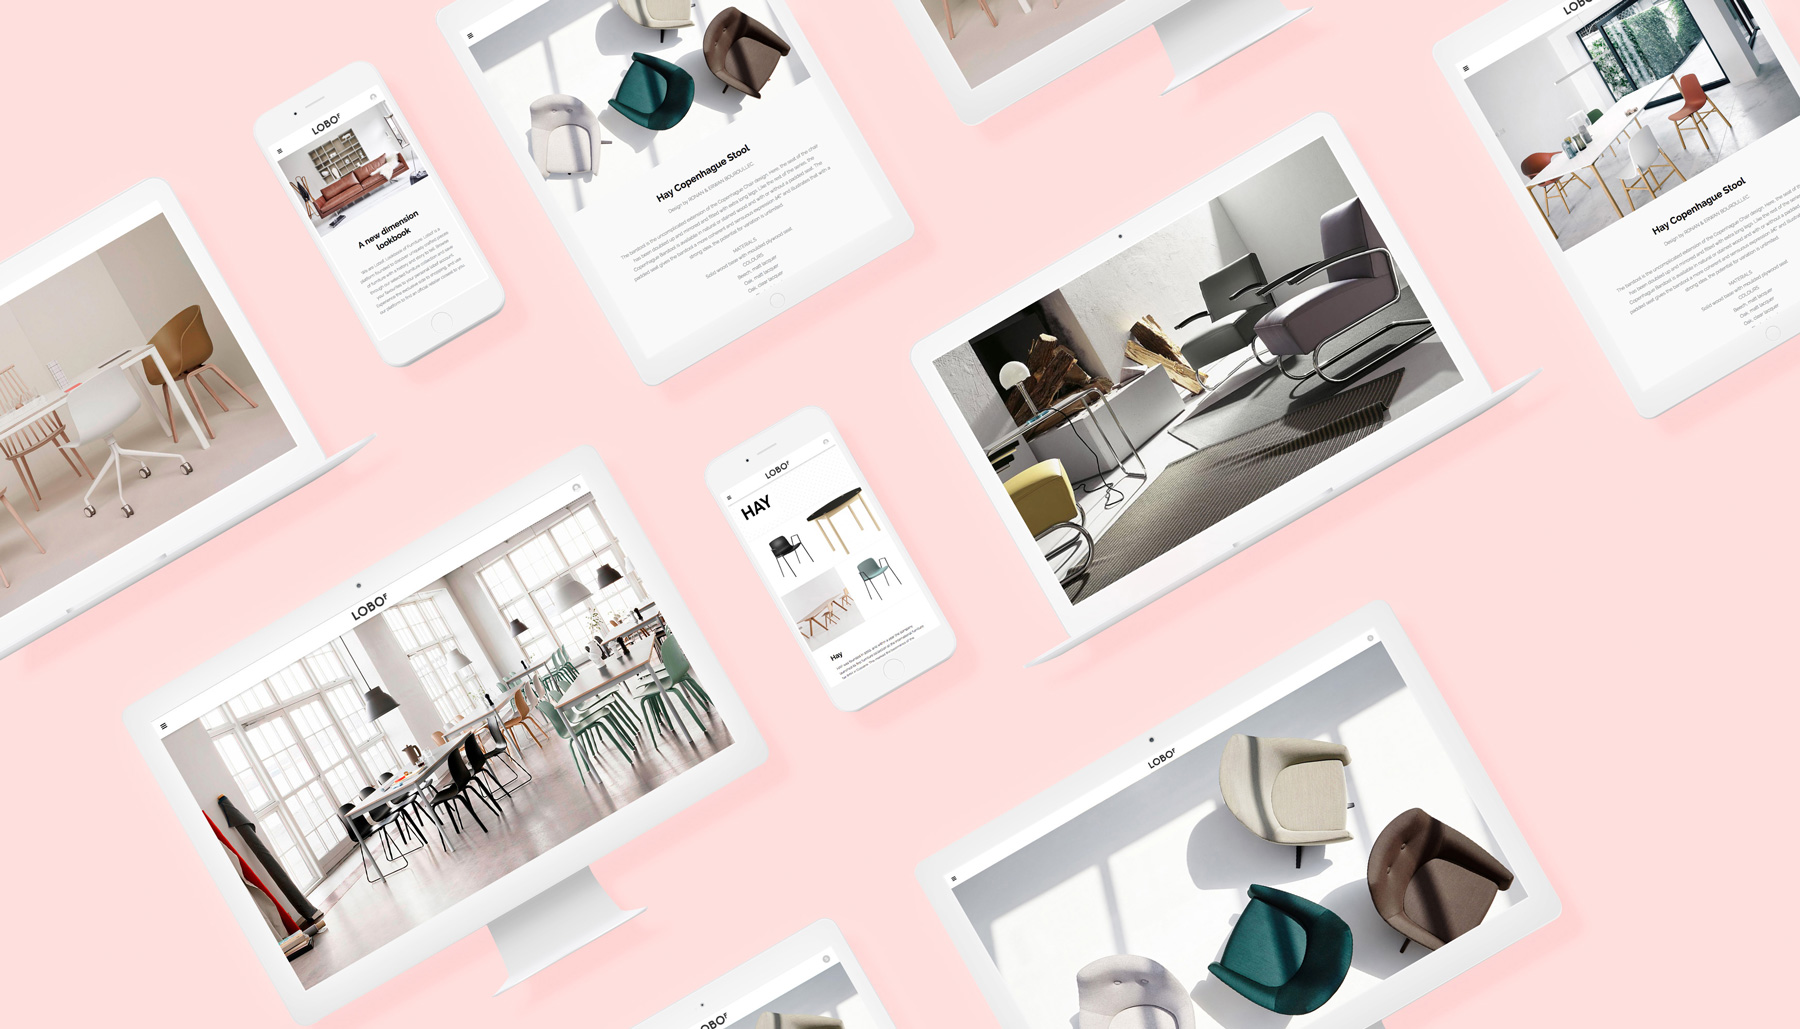 LOBOF / Dutchy Design / Branding & Design Portfolio